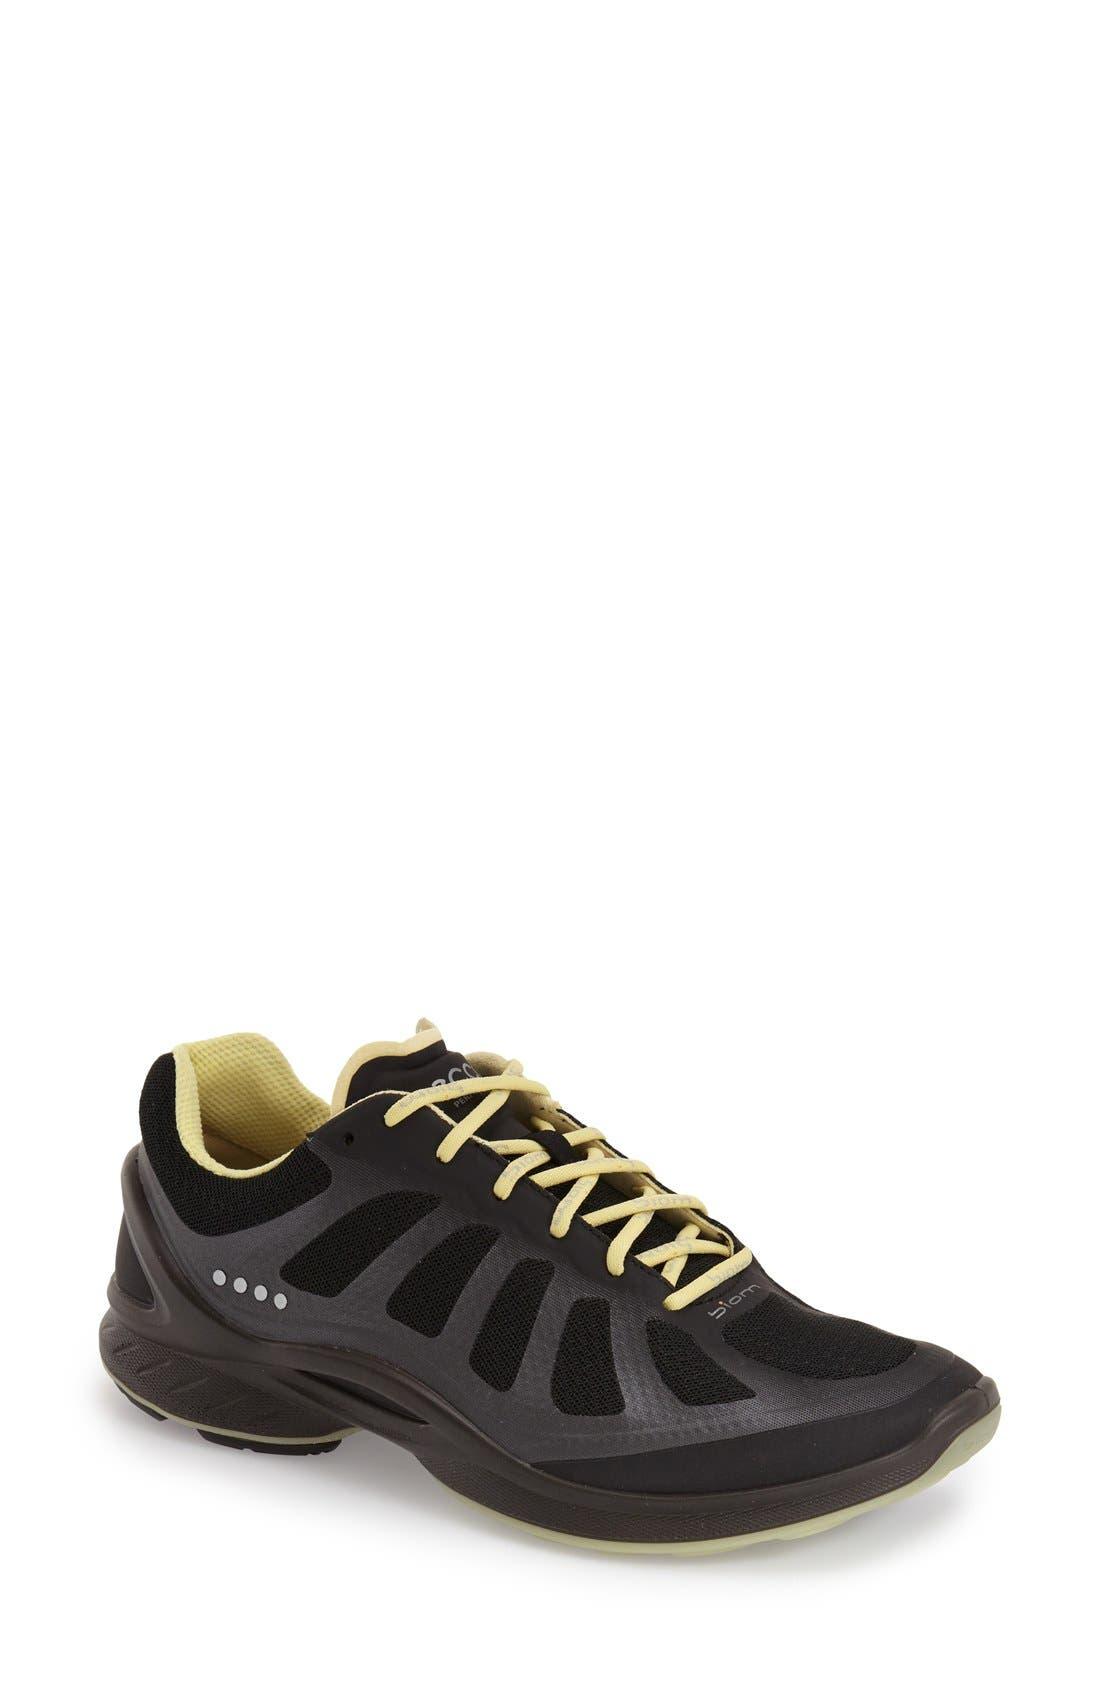 ECCO, 'BIOM Fjuel Racer' Sneaker, Main thumbnail 1, color, 017